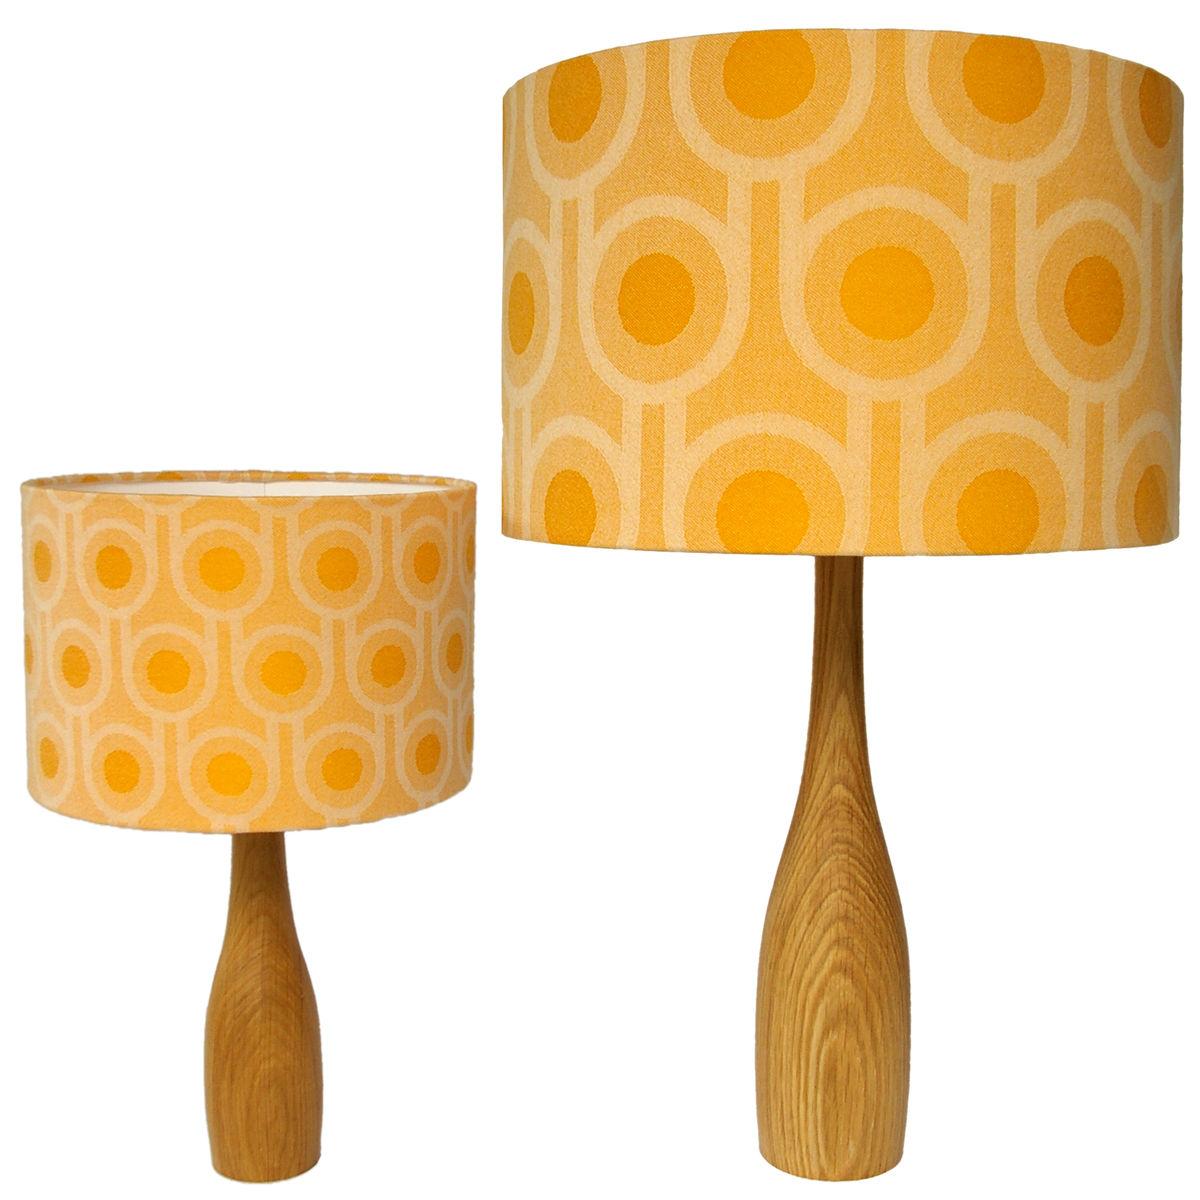 Benedict Dawn lampshade - product image. 123456